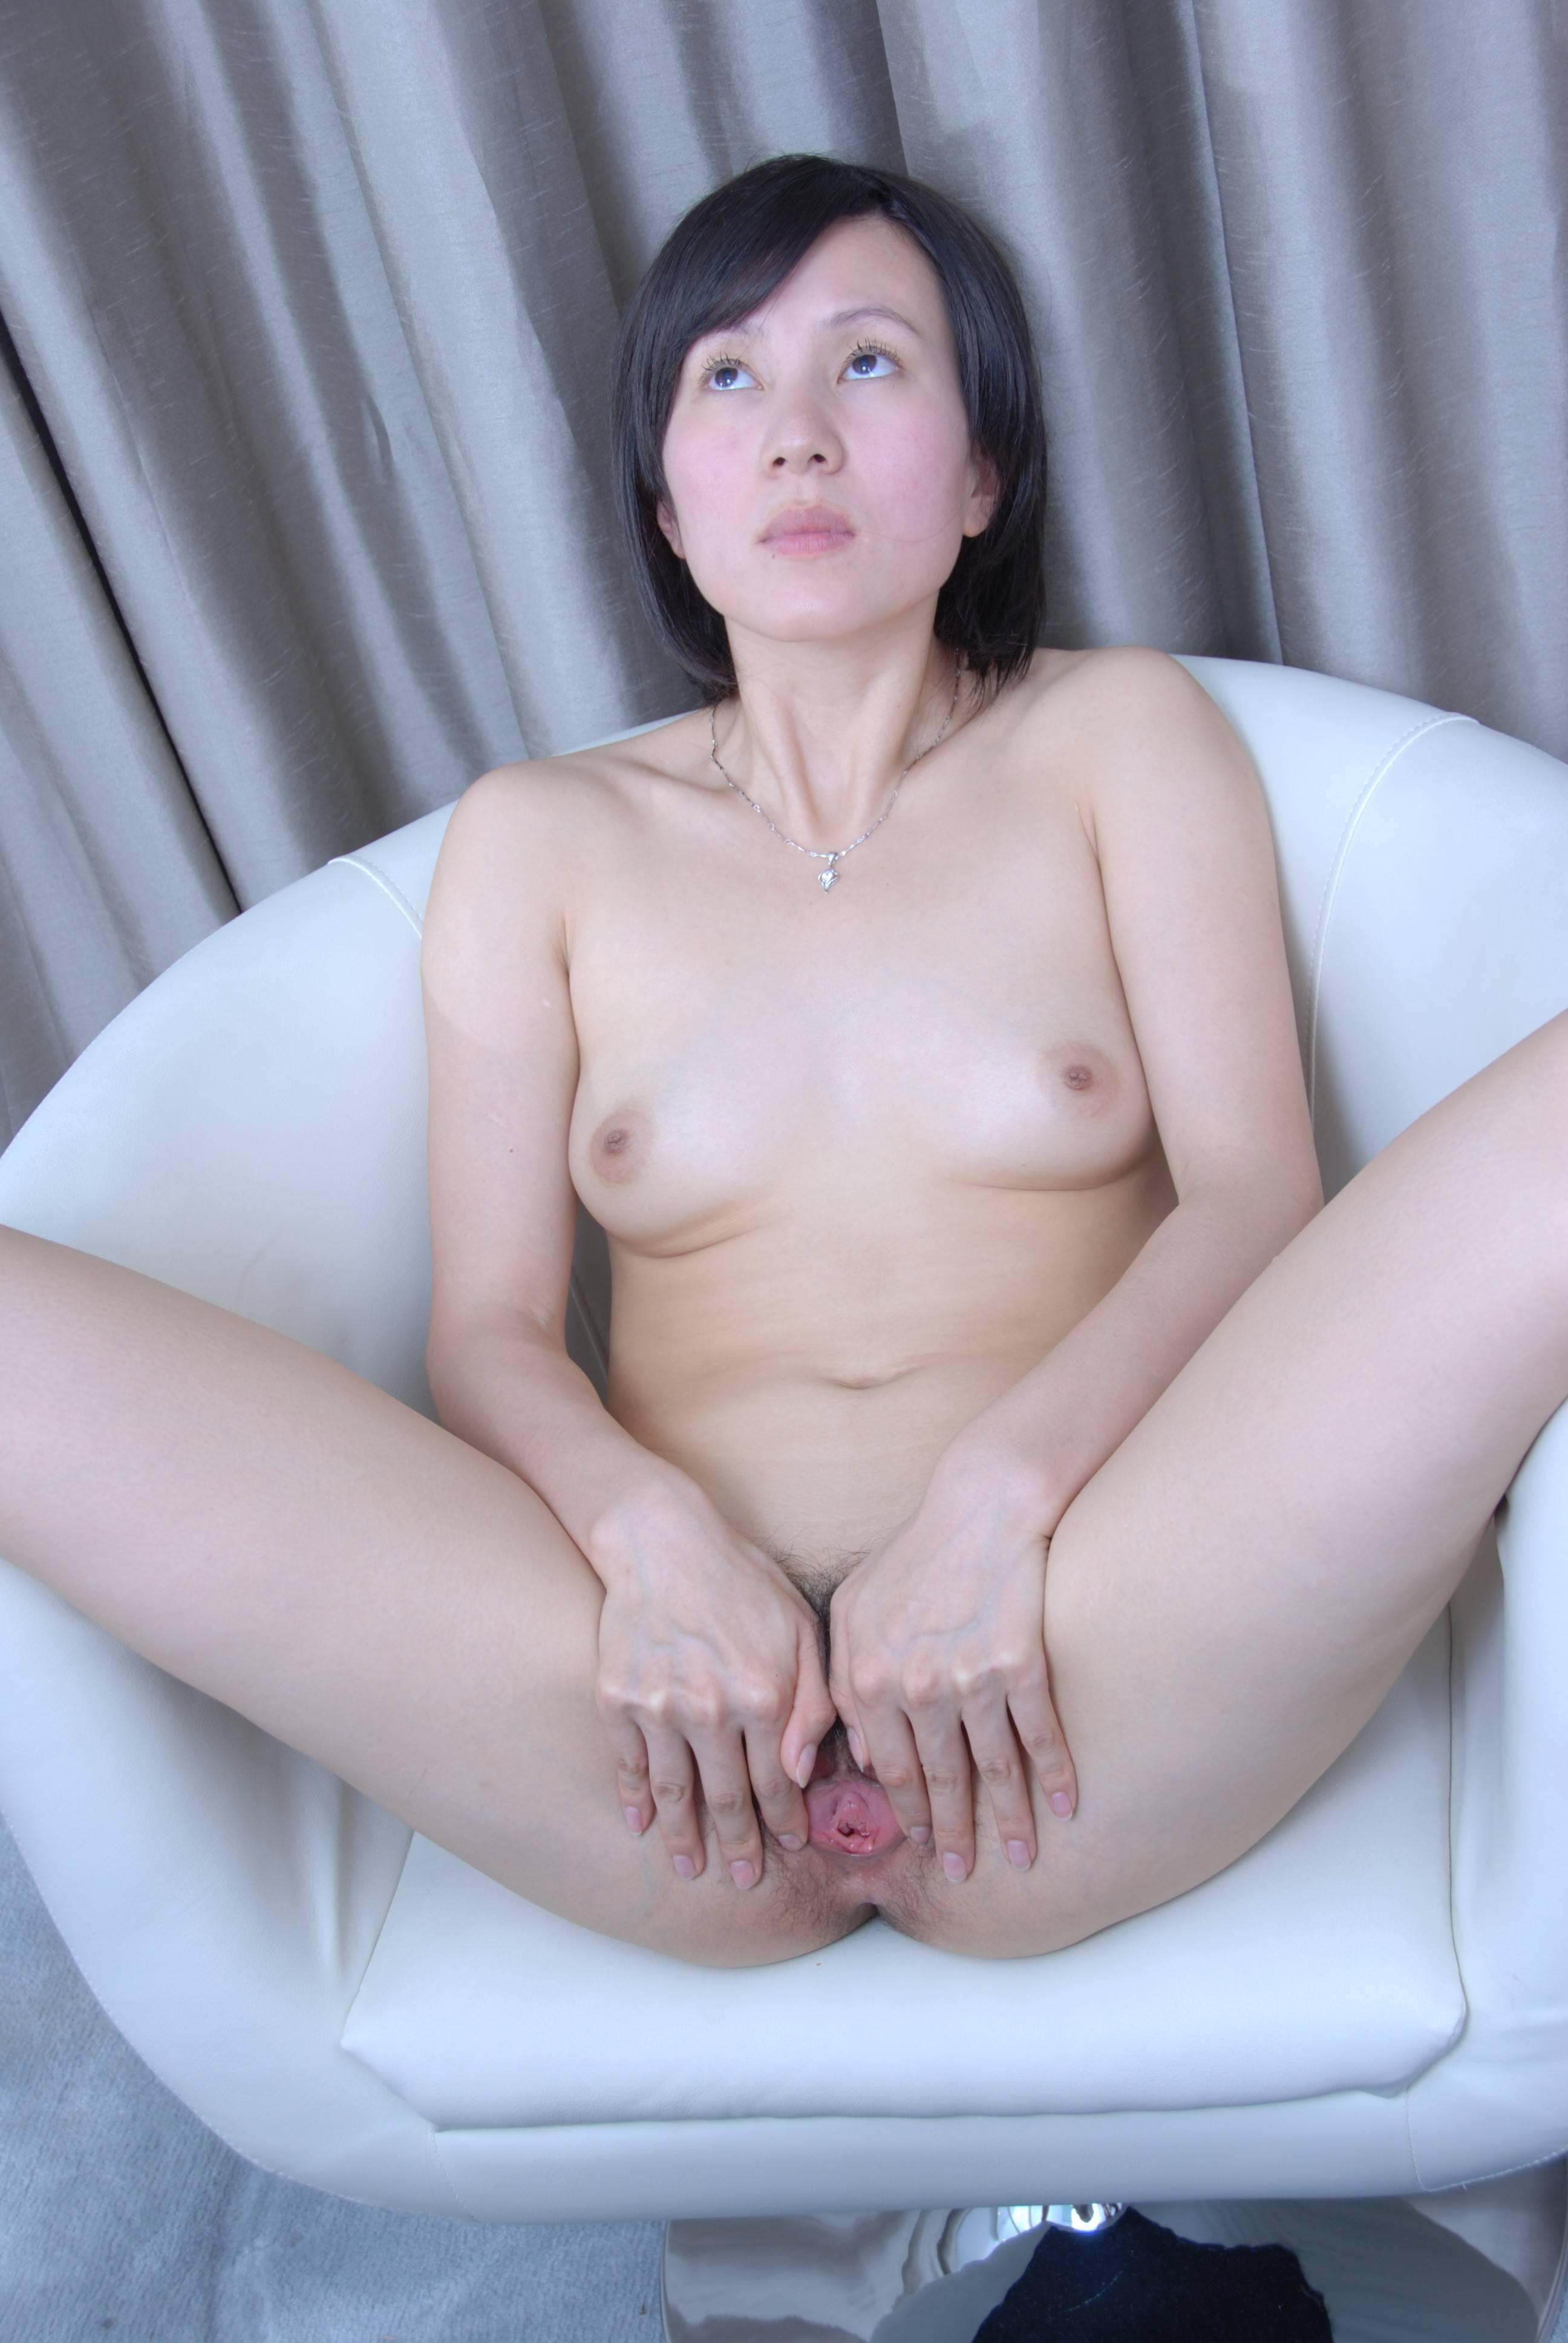 yukikax 辻作品 japanese pussy yukikax 辻作品 japanese pussy yukikax 辻作品 japanese pussy國模美小穴